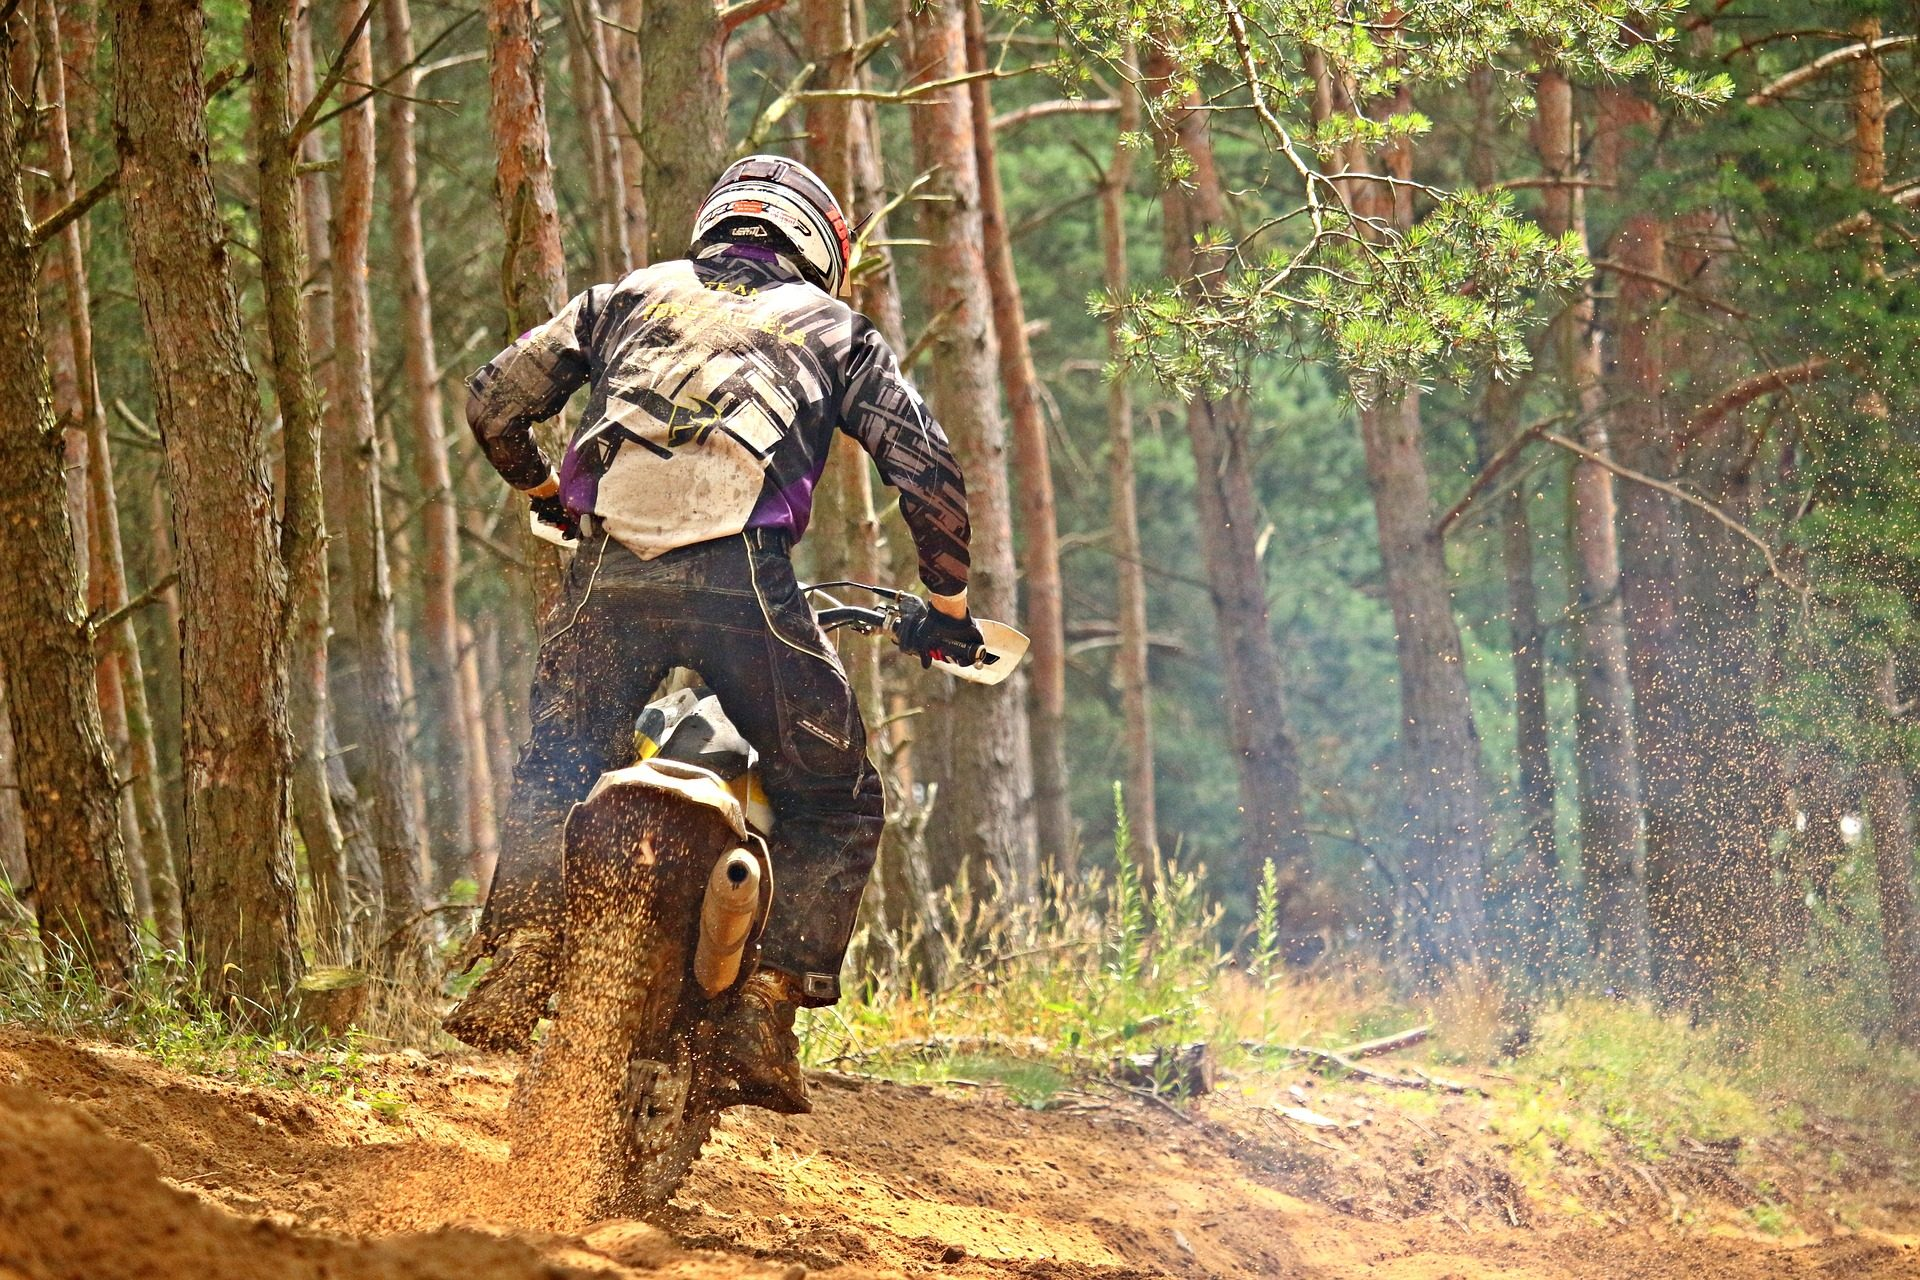 motocicleta, motorista, motocross, barro, bosque, pista, velocidad, riesgo - Fondos de Pantalla HD - professor-falken.com